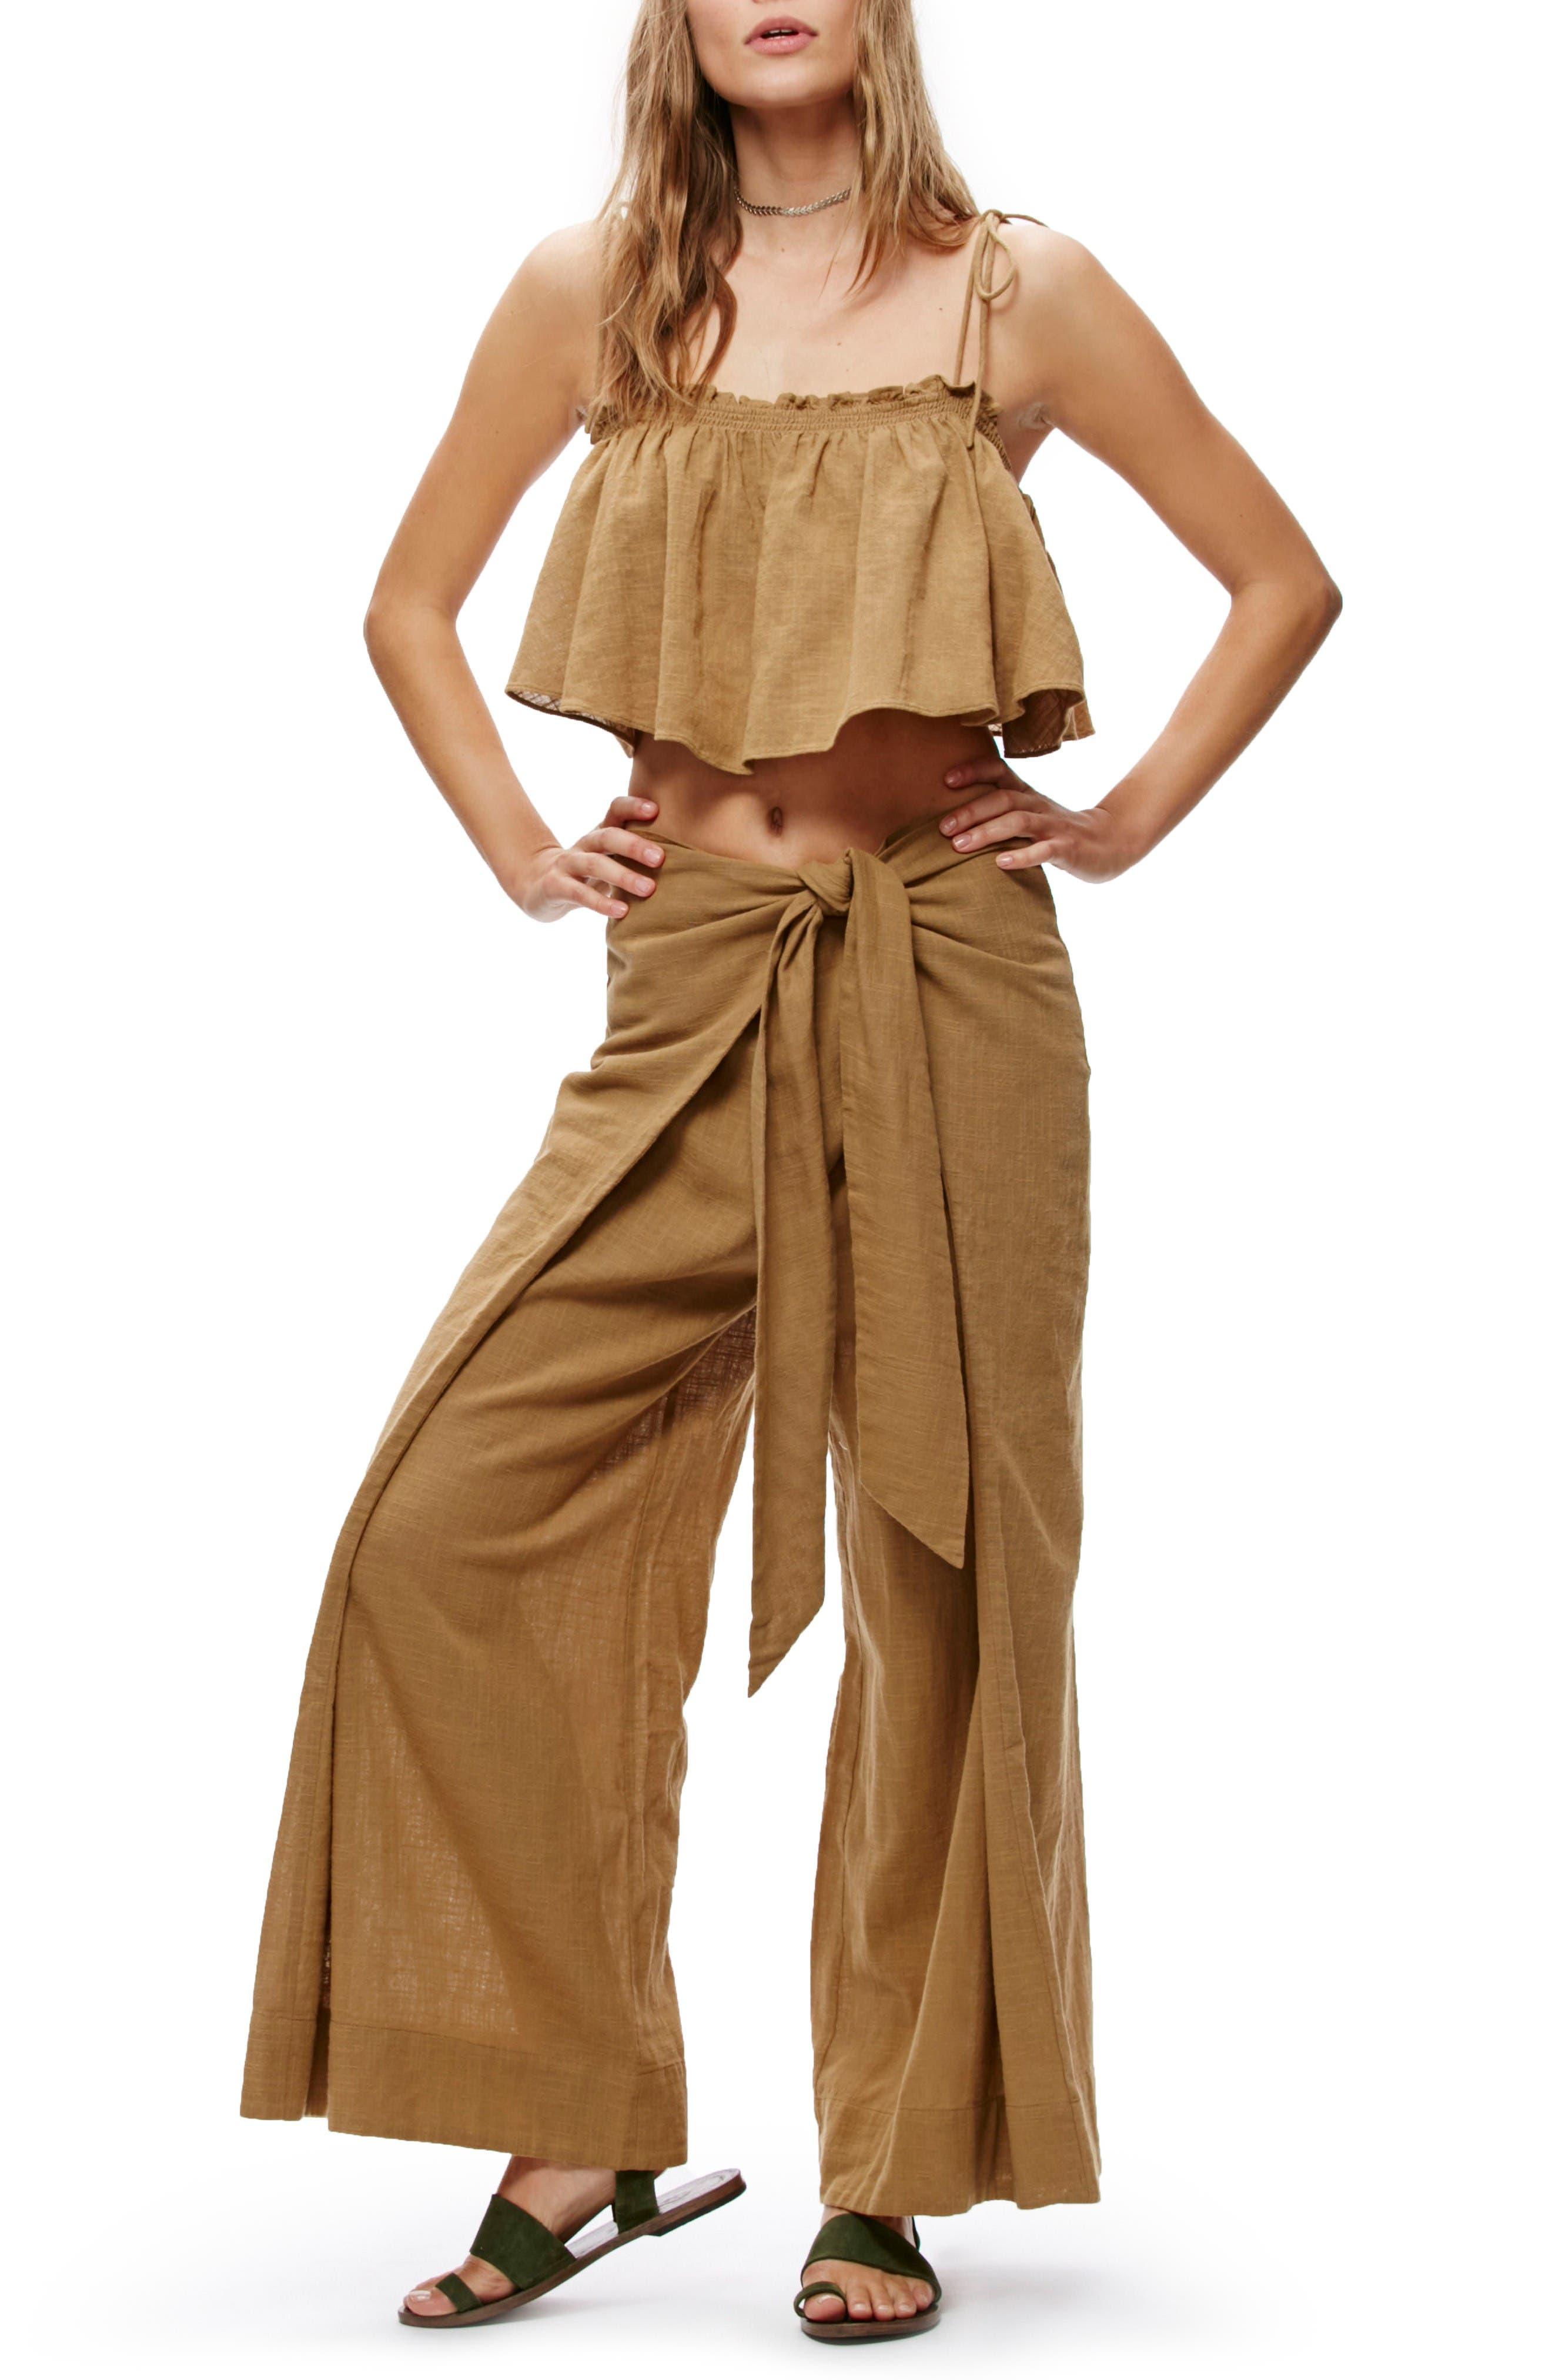 Free People Tropic Babe Crop Top & High Waist Pants Set